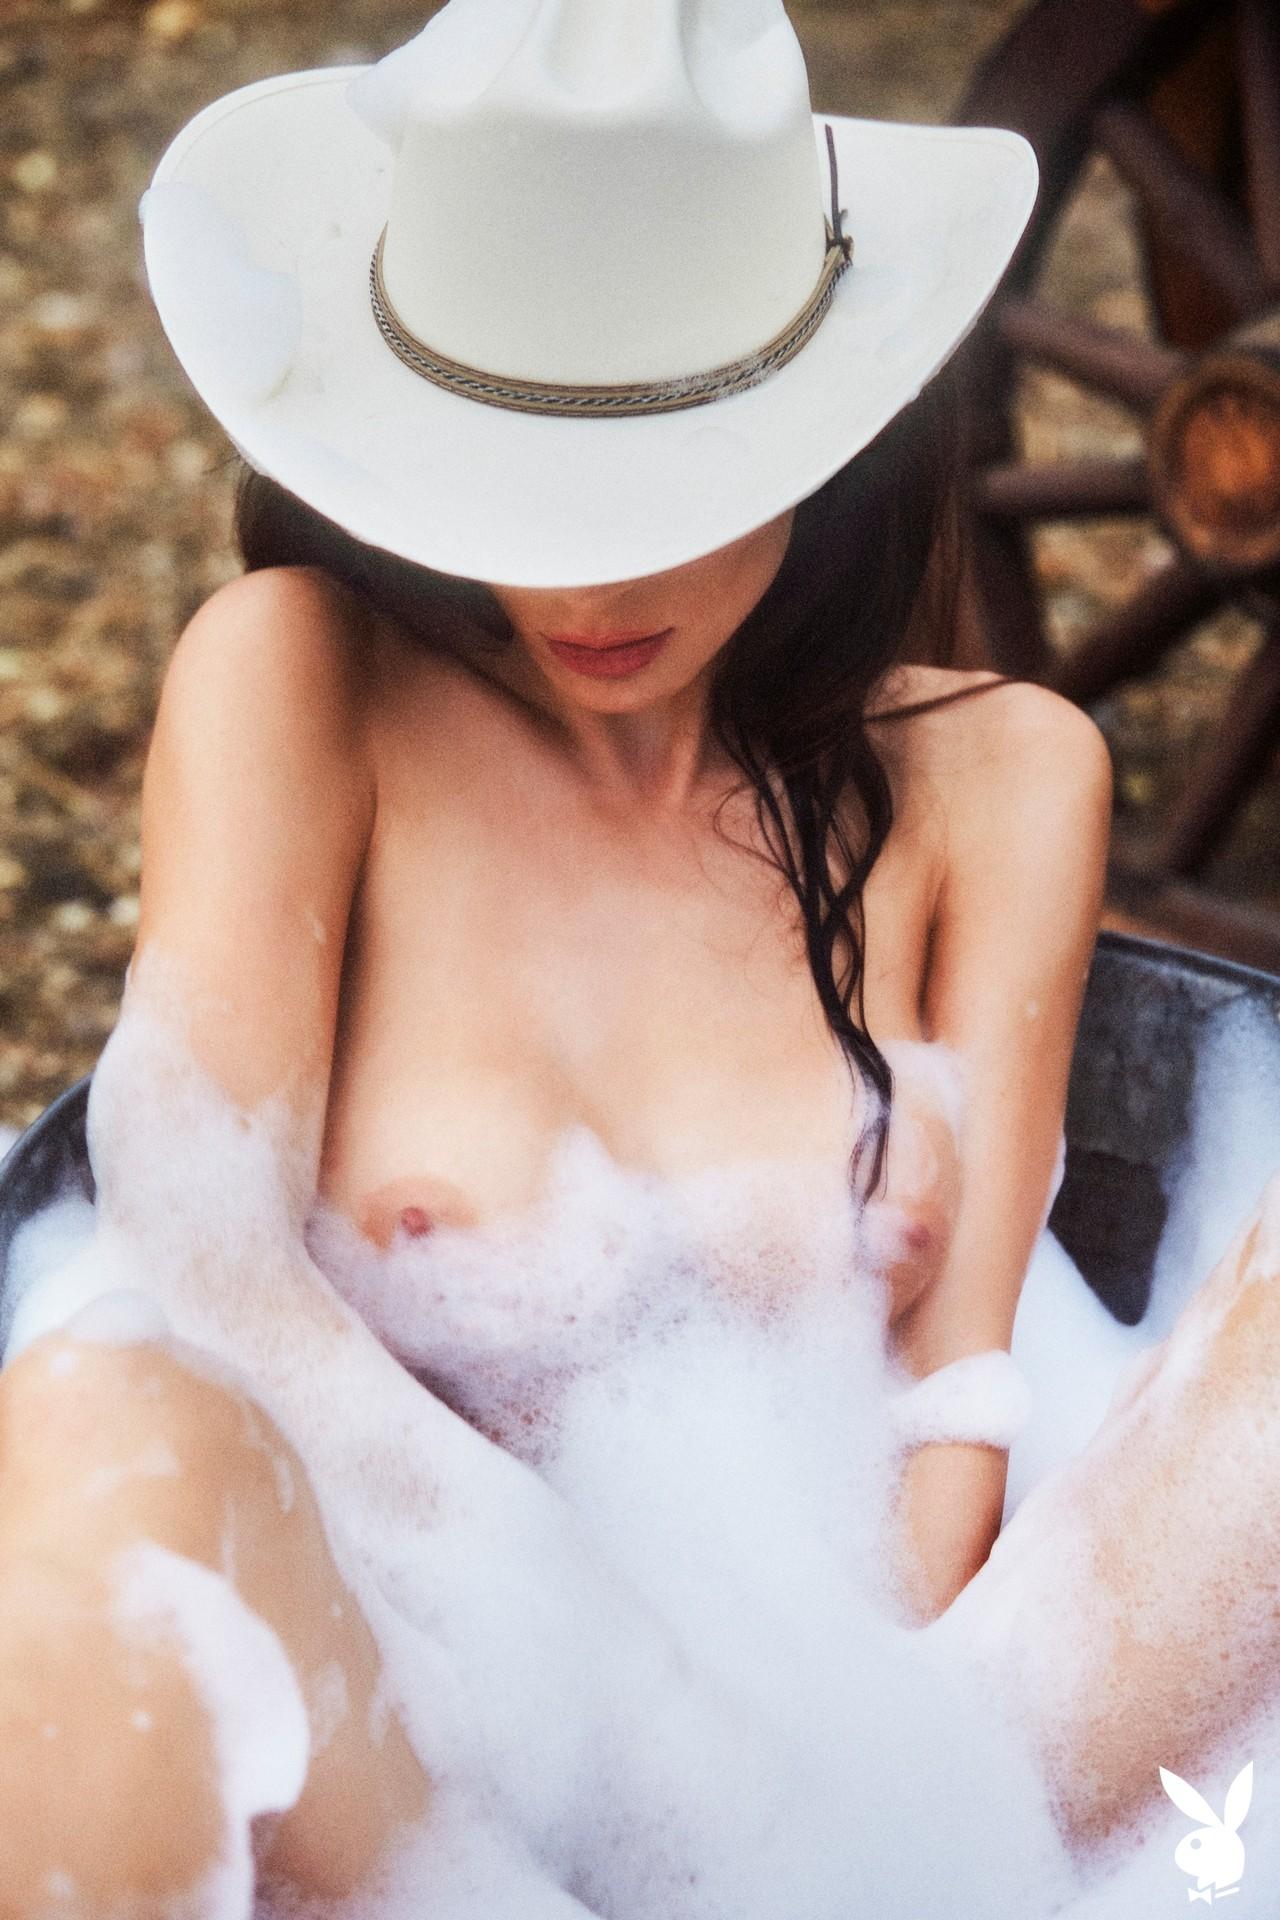 The Road To Lana Rhoades Playboy Plus (30)